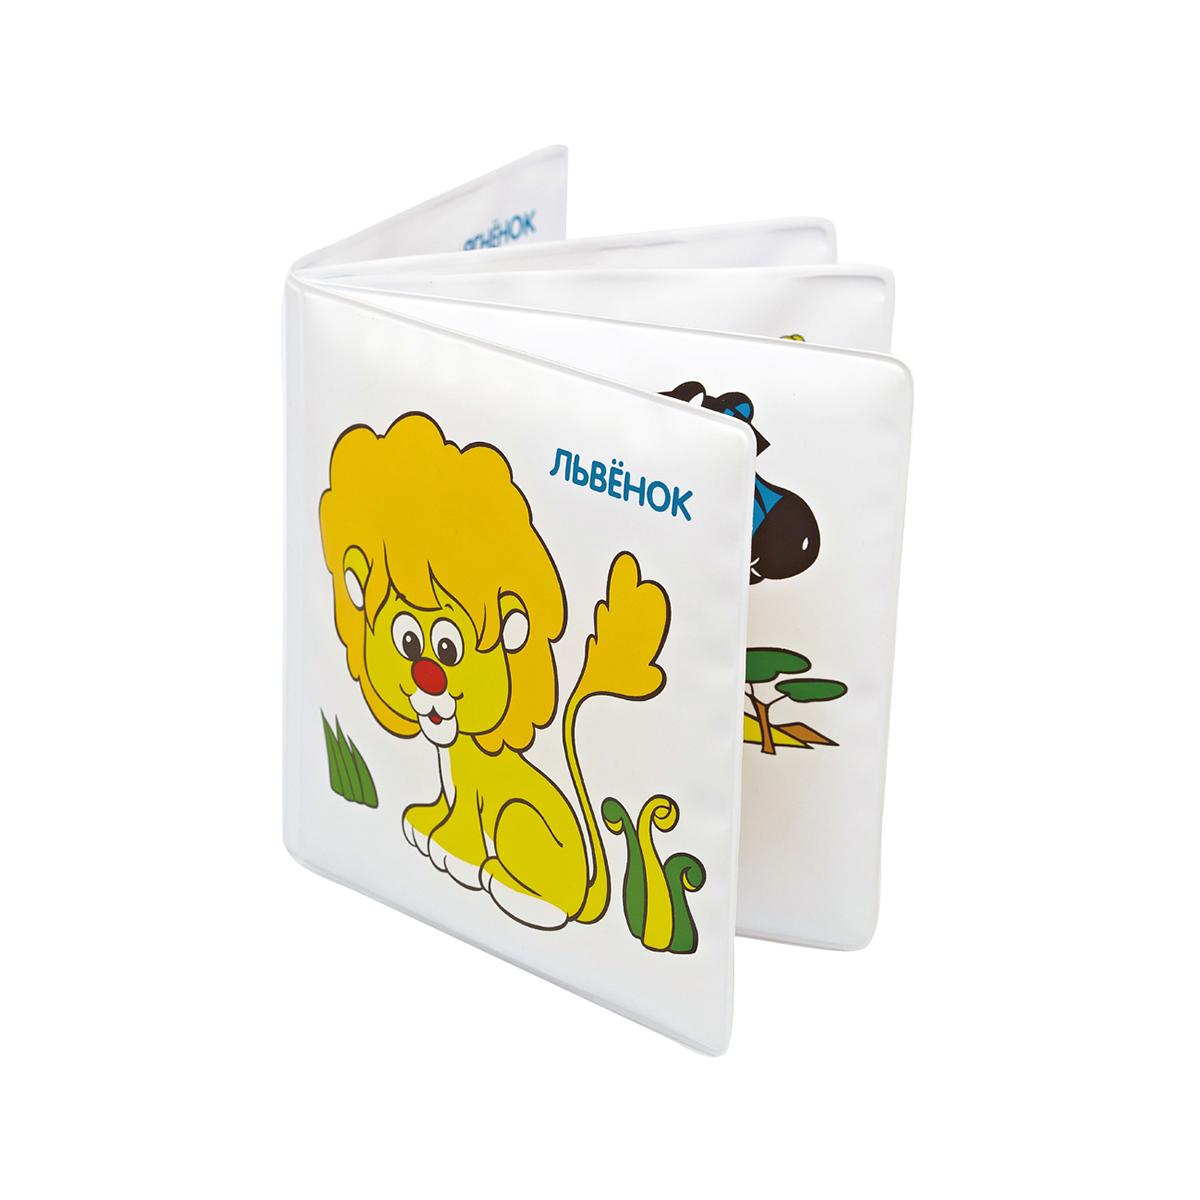 Курносики Игрушка-книжка с пищалкой Зоопарк игрушка сортер курносики